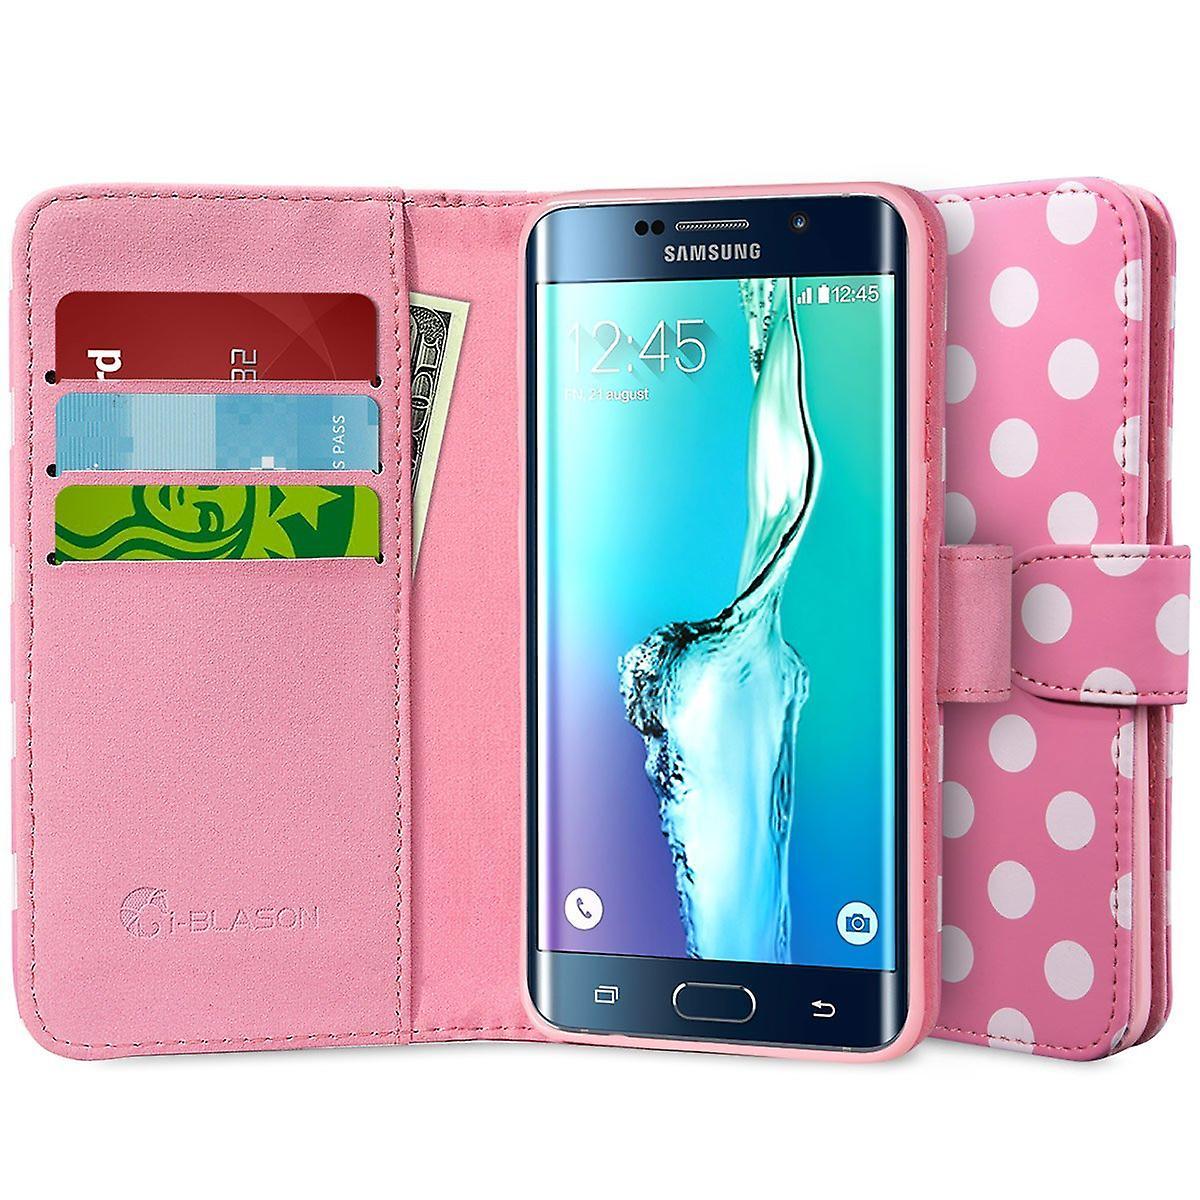 i-Blason Galaxy S6 Edge Plus Leather Wallet Case - Dal Pink